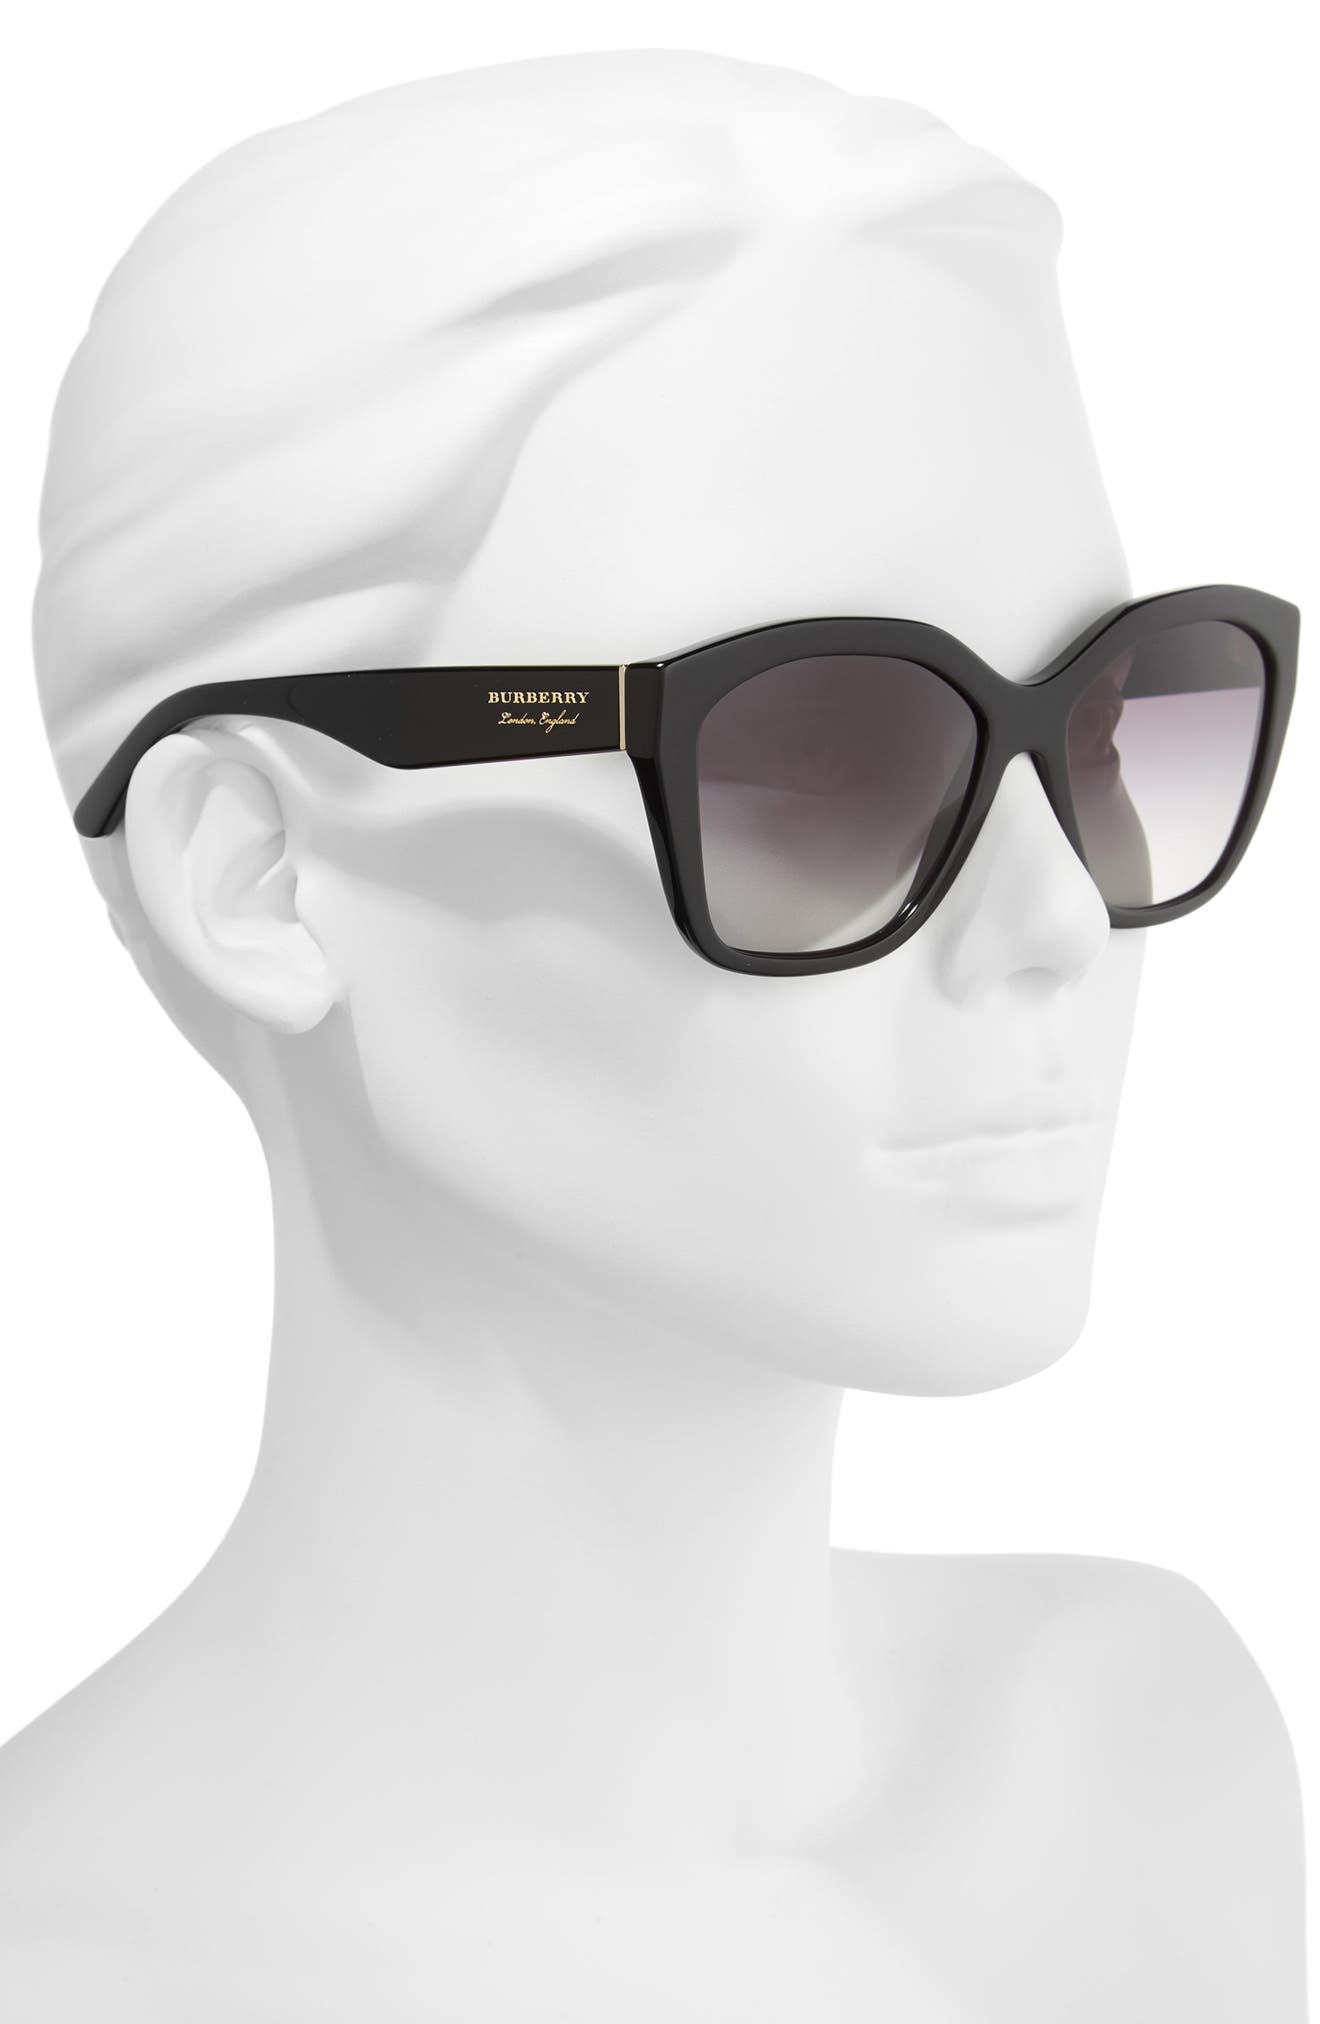 57mm Gradient Sunglasses,                             Alternate thumbnail 3, color,                             BLACK